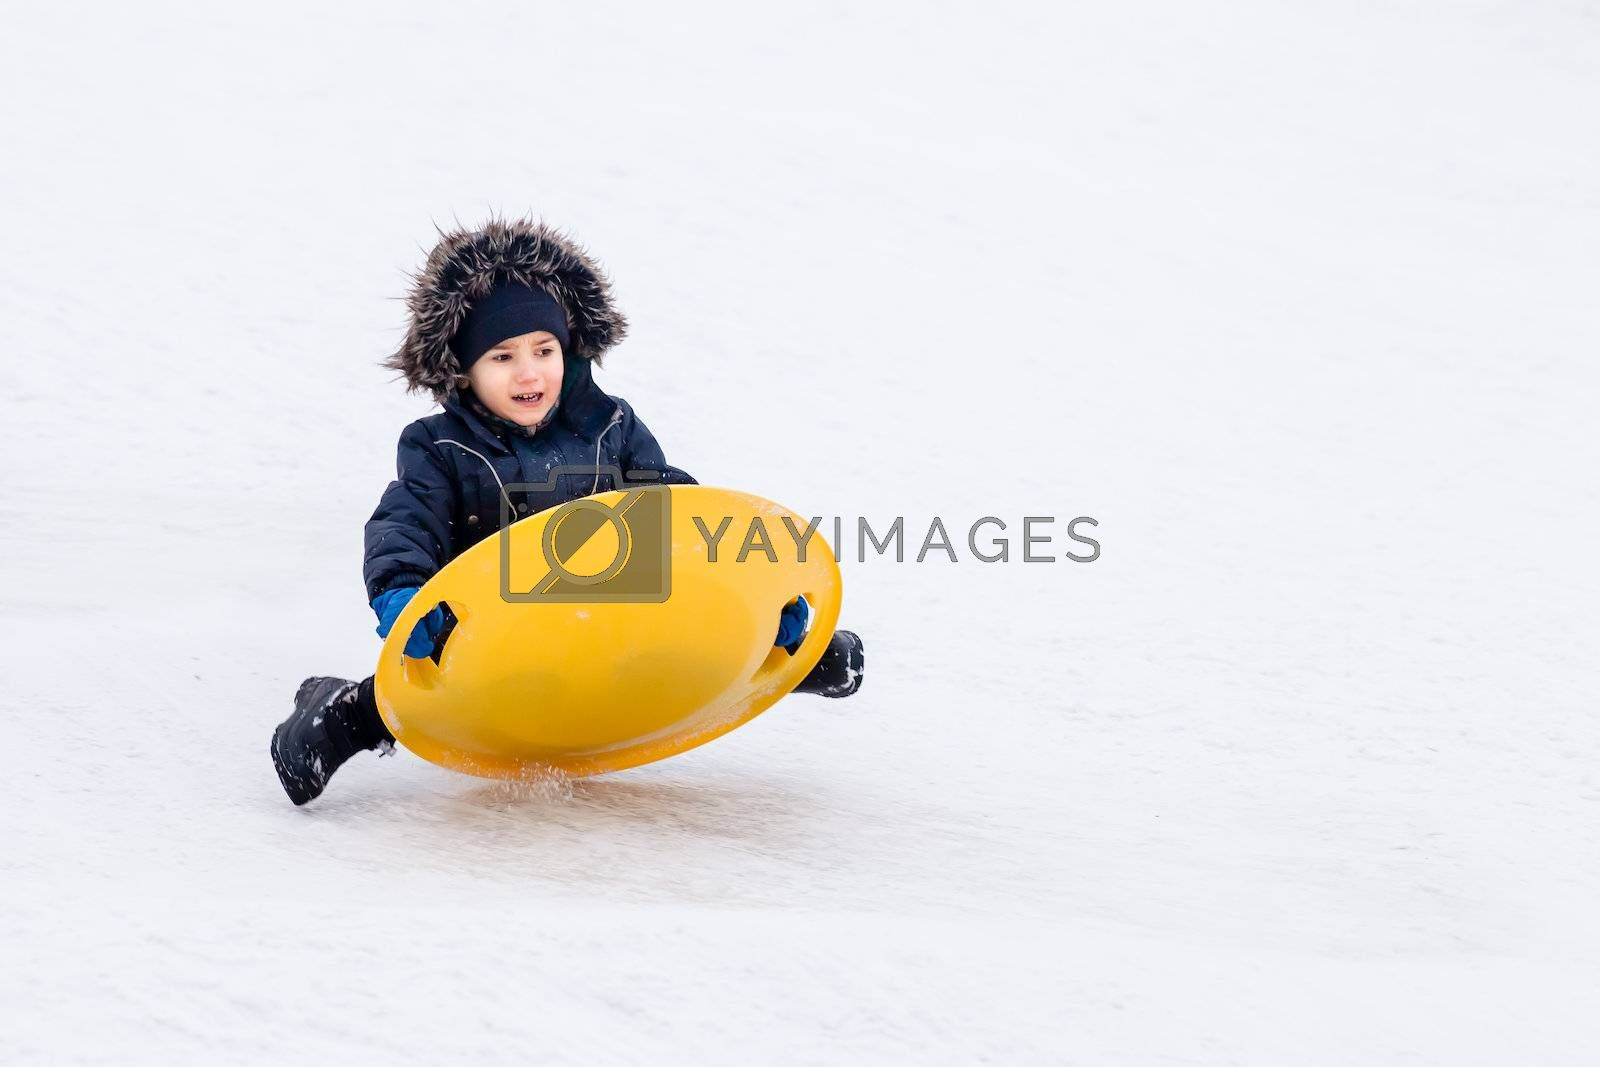 Boy on sleigh. Sledding at winter time